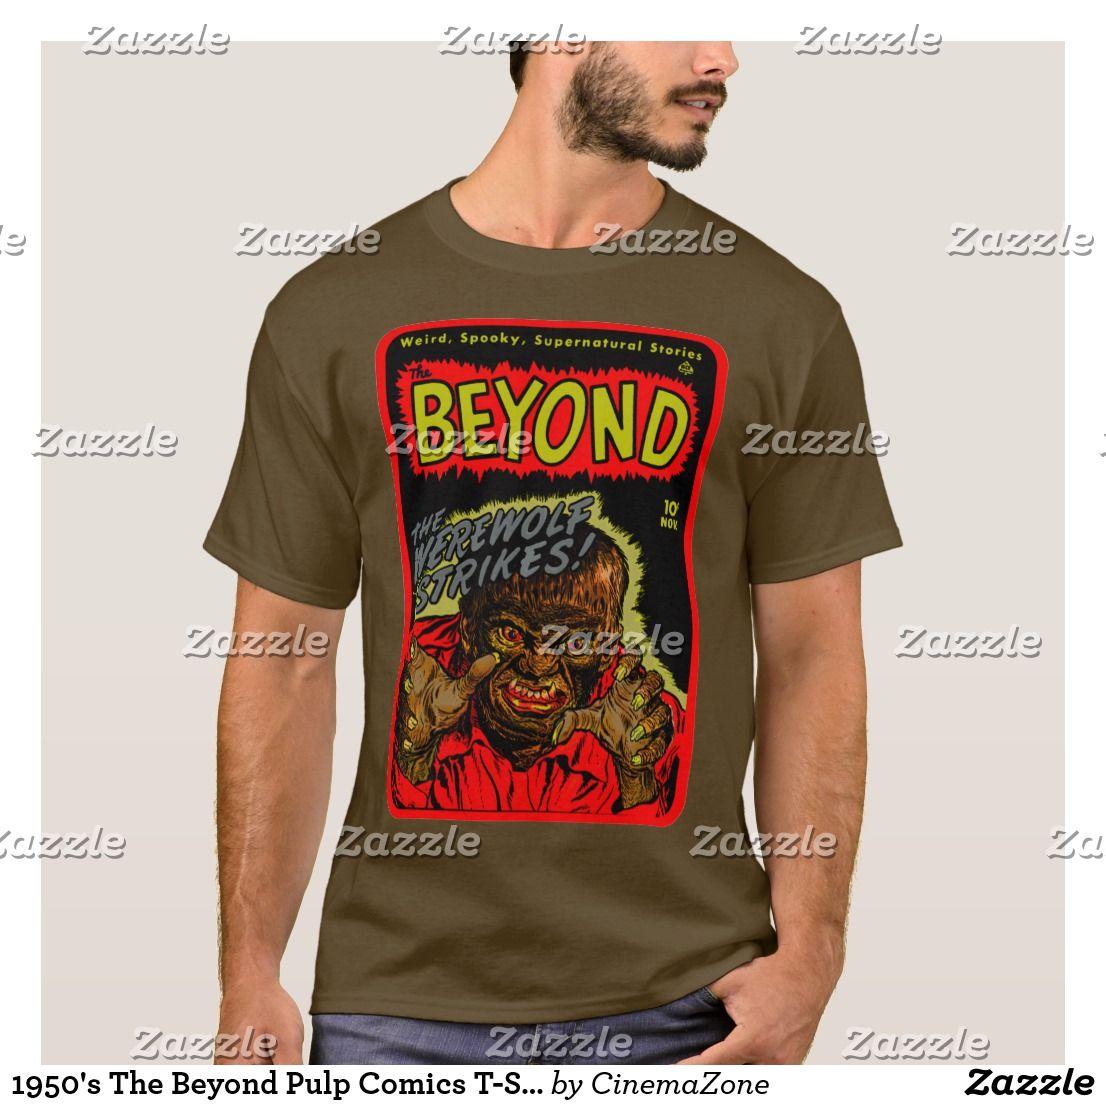 9c10183ad5 1950's The Beyond Pulp Comics T-Shirt, t-shirt, Men's novelty T-shirts,  Women's novelty t-shirts, vintage t shirts guys, funny t shirts, cheap  funny t ...